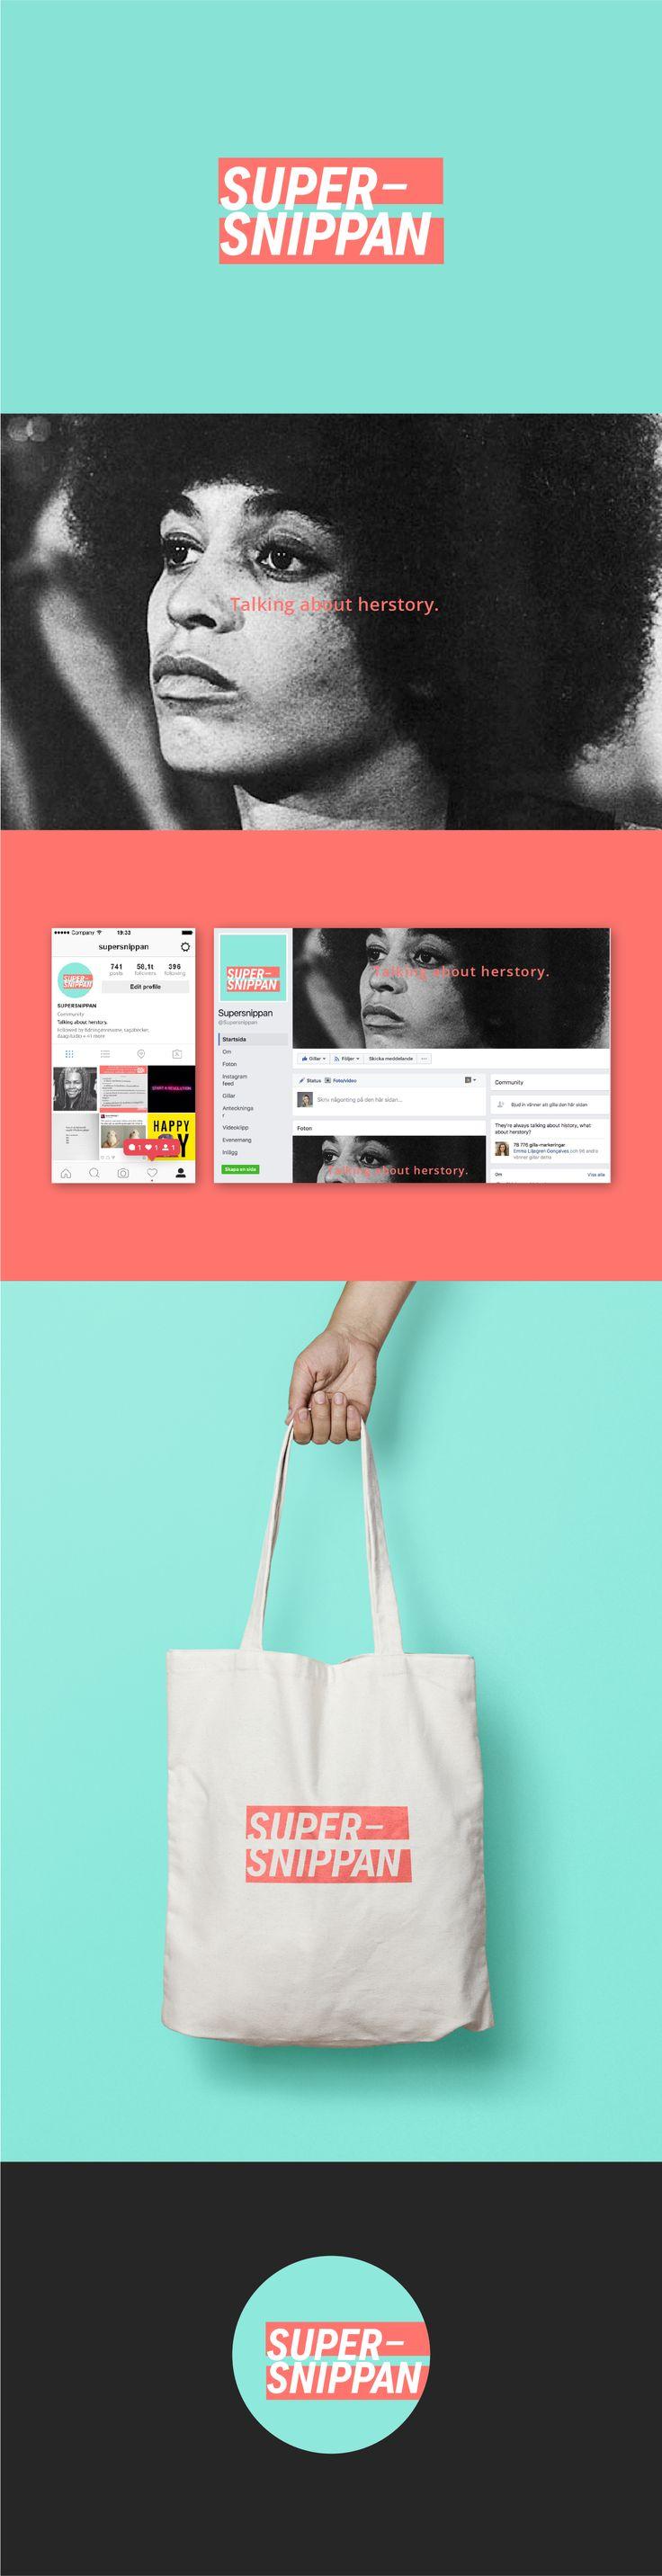 Branding for Supersnippan by Sandra Liljegren